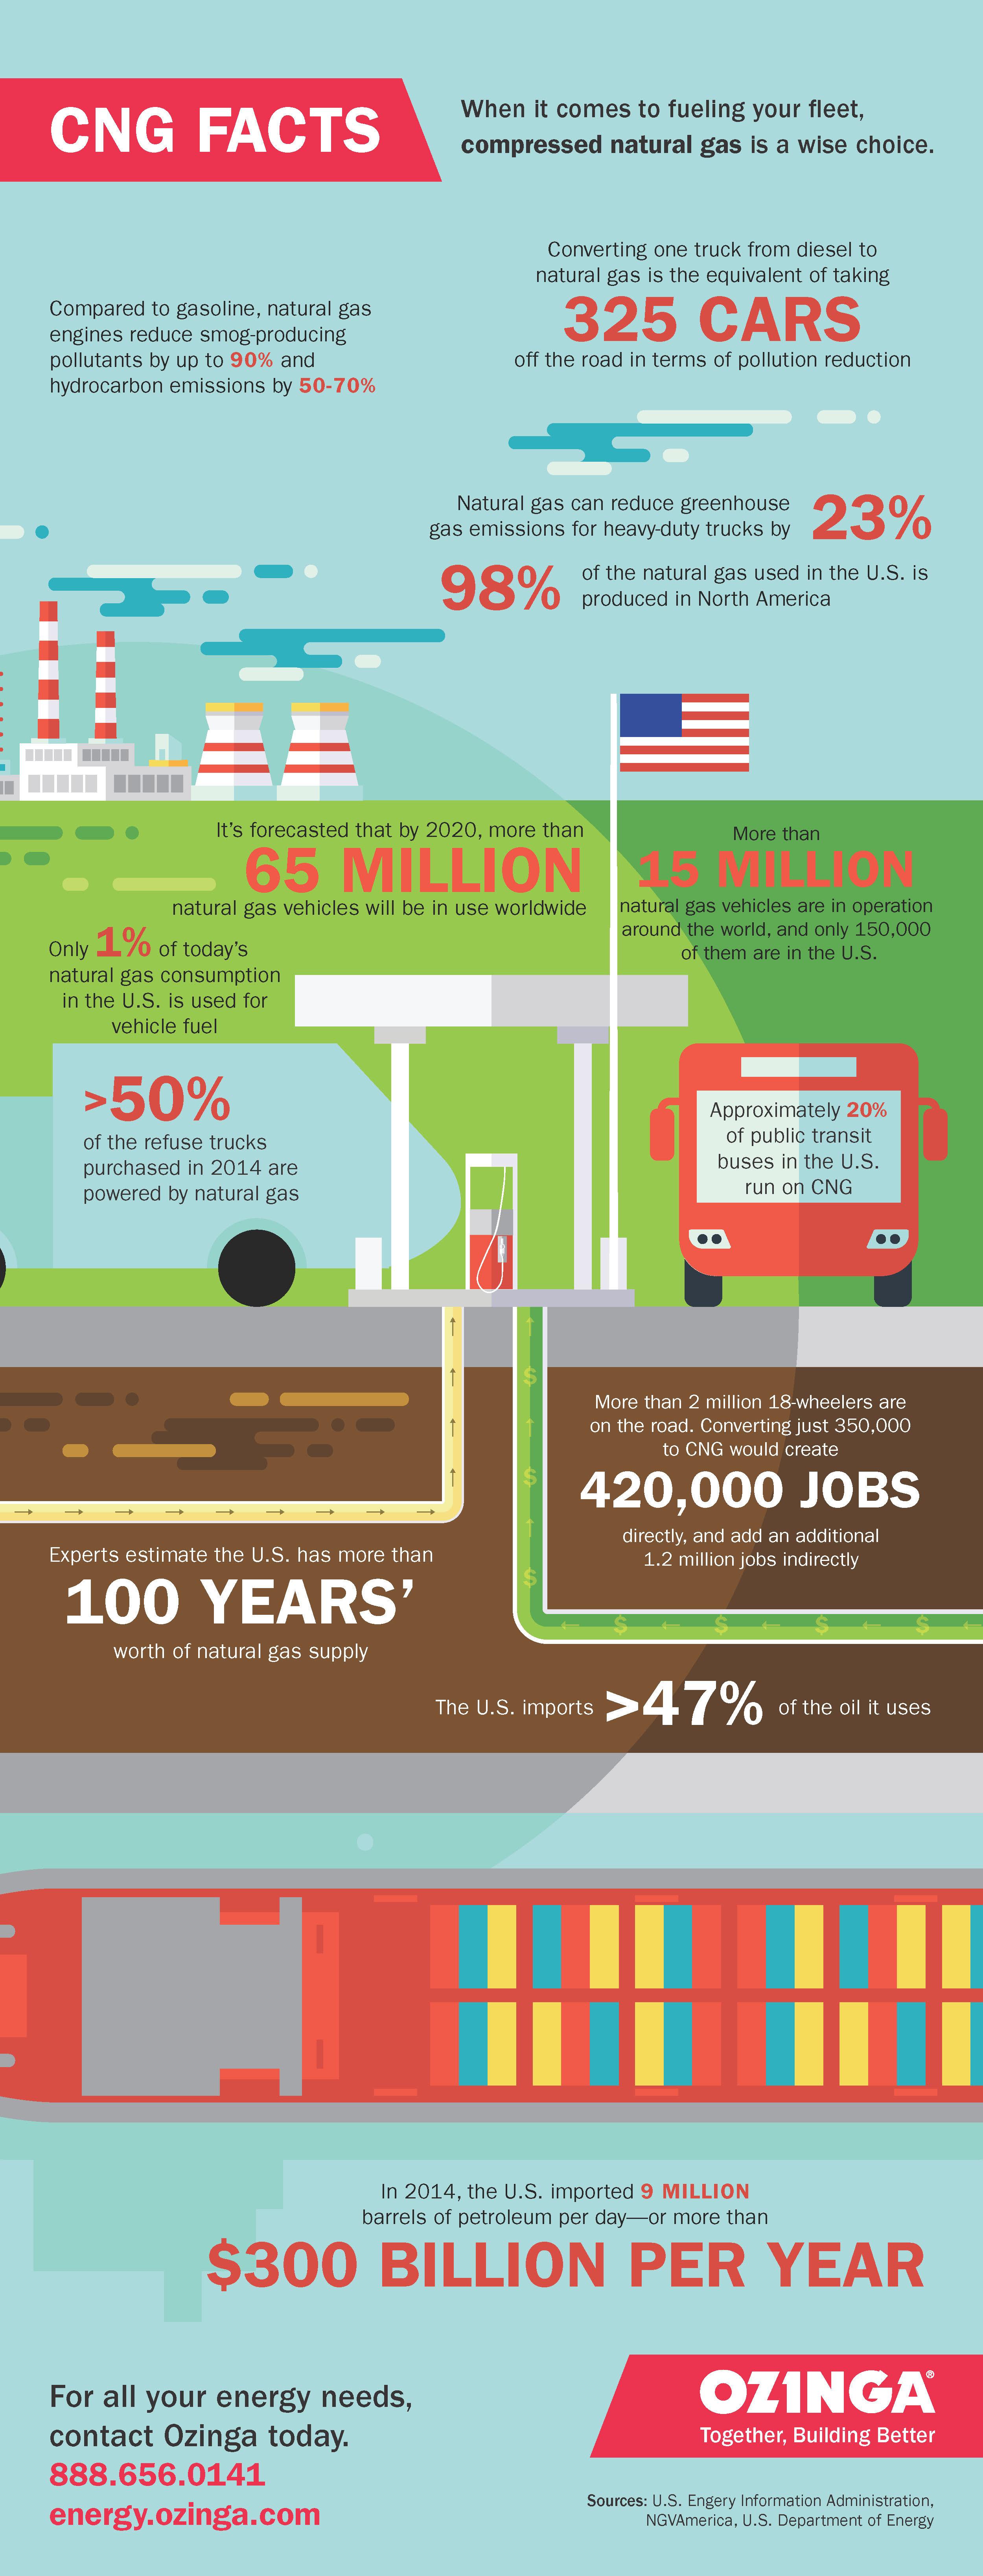 OZINGA CNG FACTS |  Infographic Design